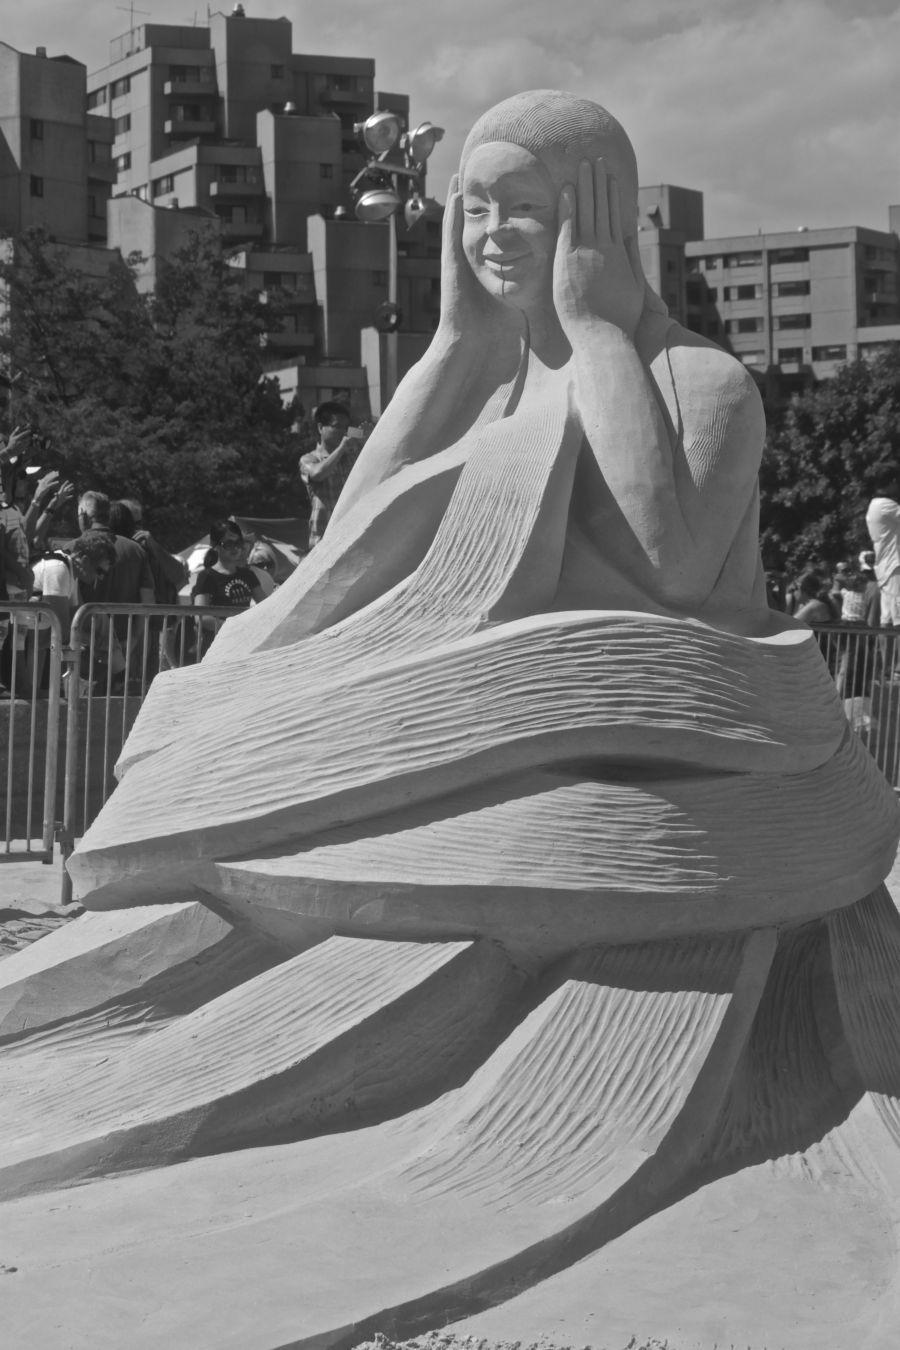 boston revere beach National Sand Sculpting Festival woman curving bottom